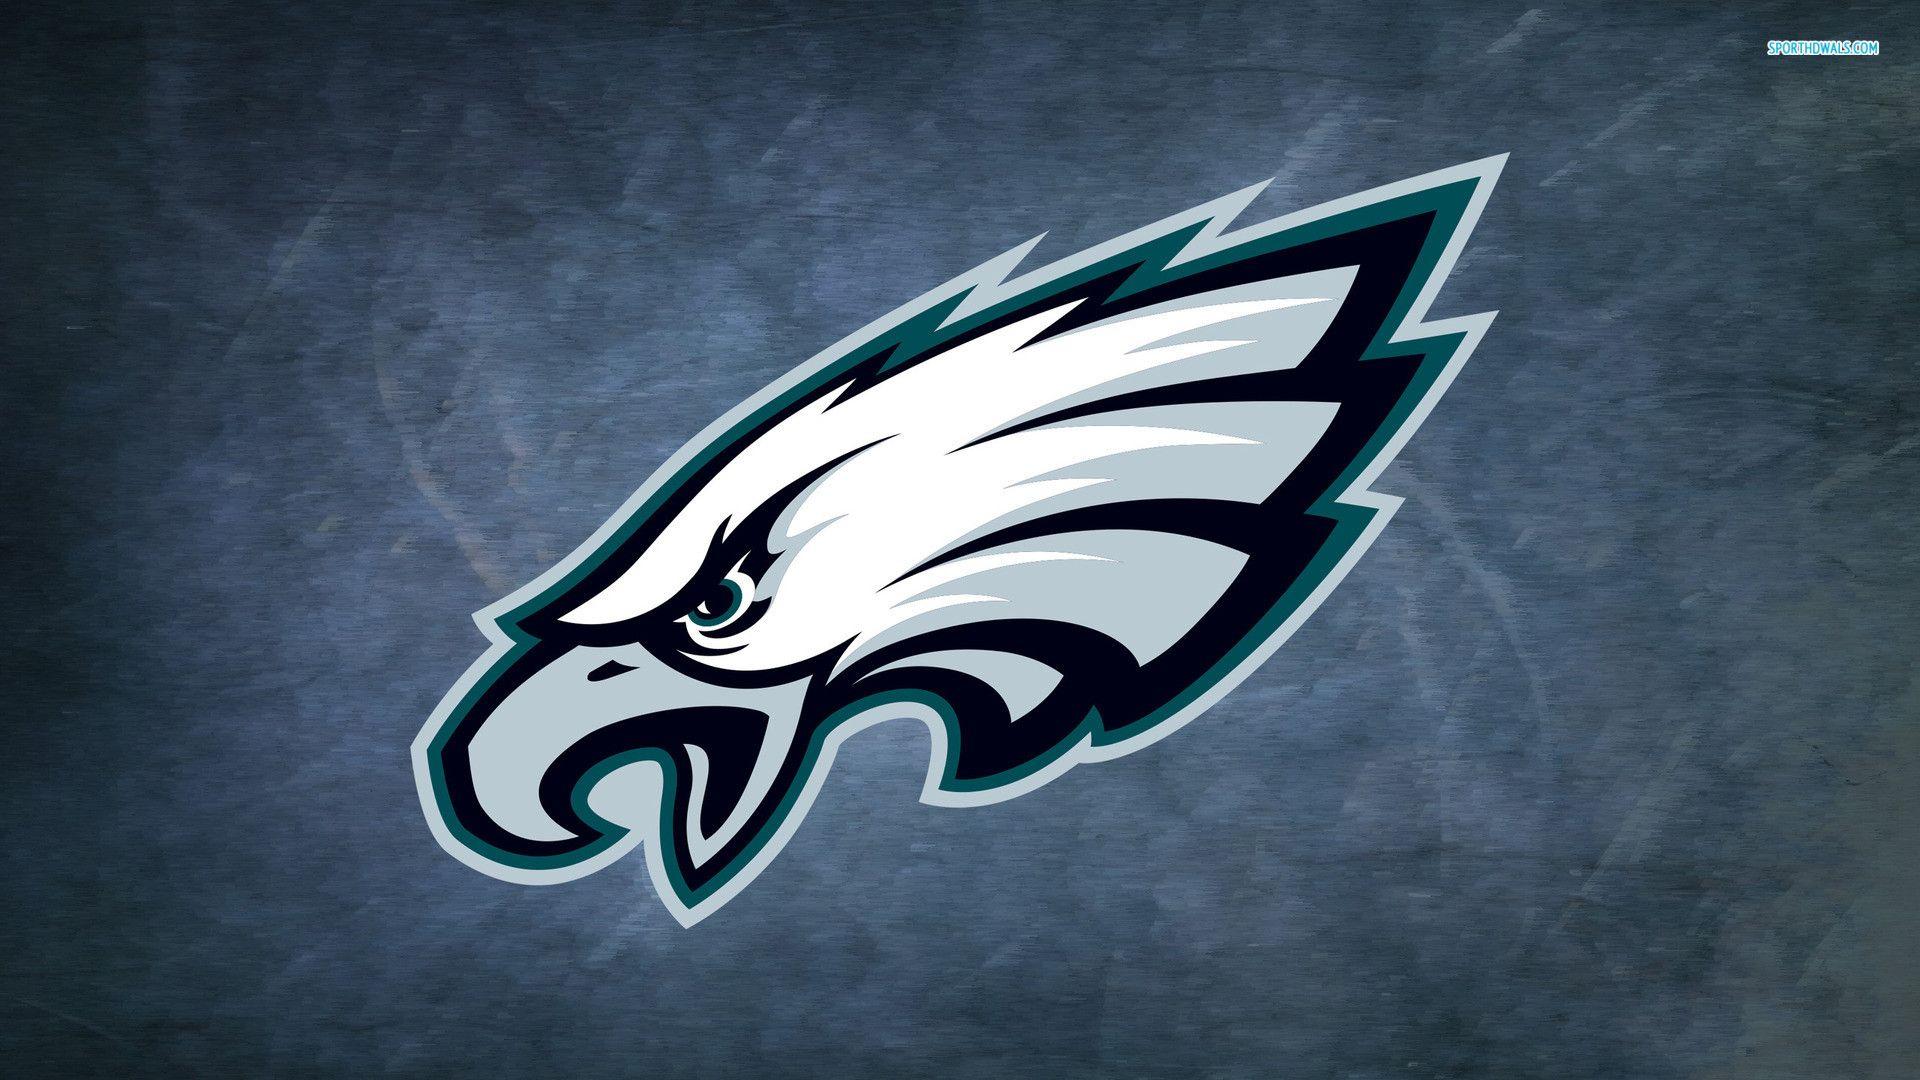 eagles logo wallpaper